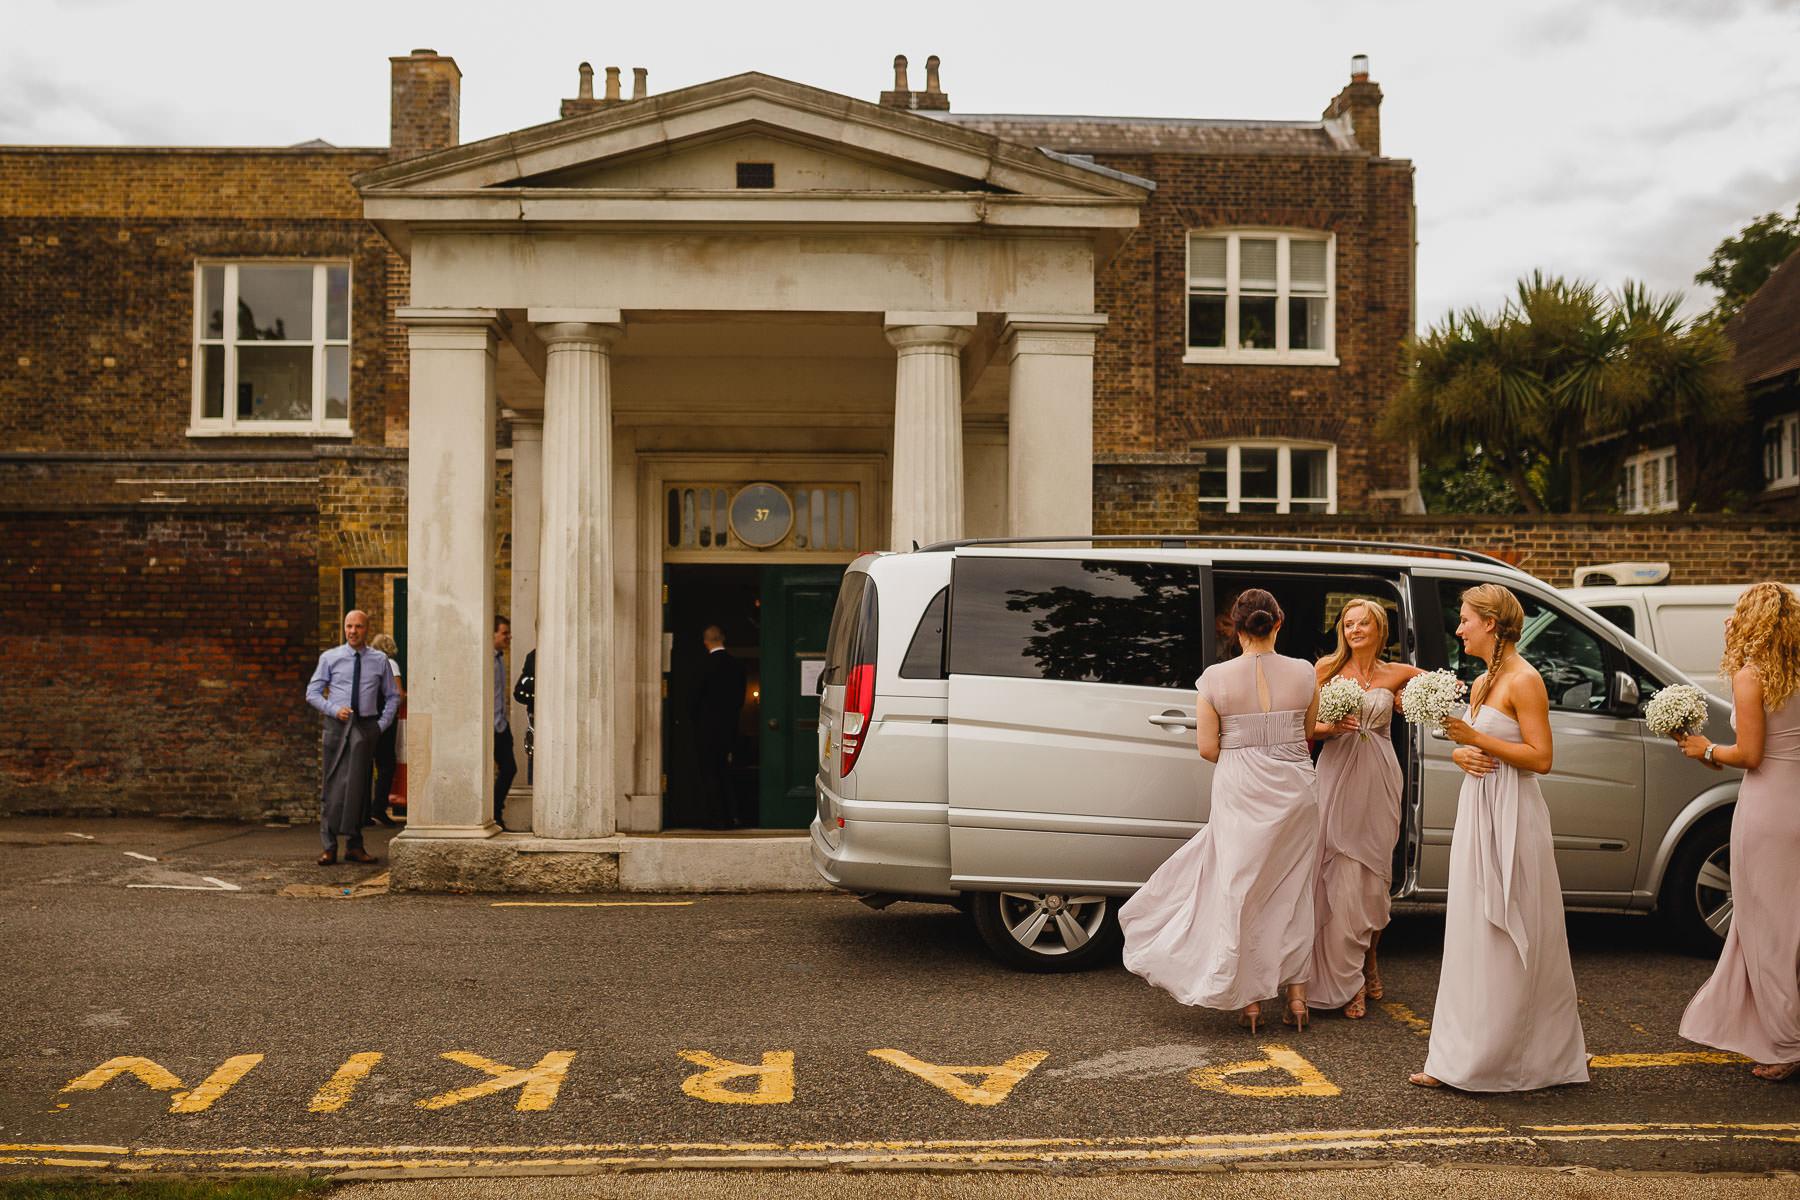 kew gardens wedding photography astra duncan6